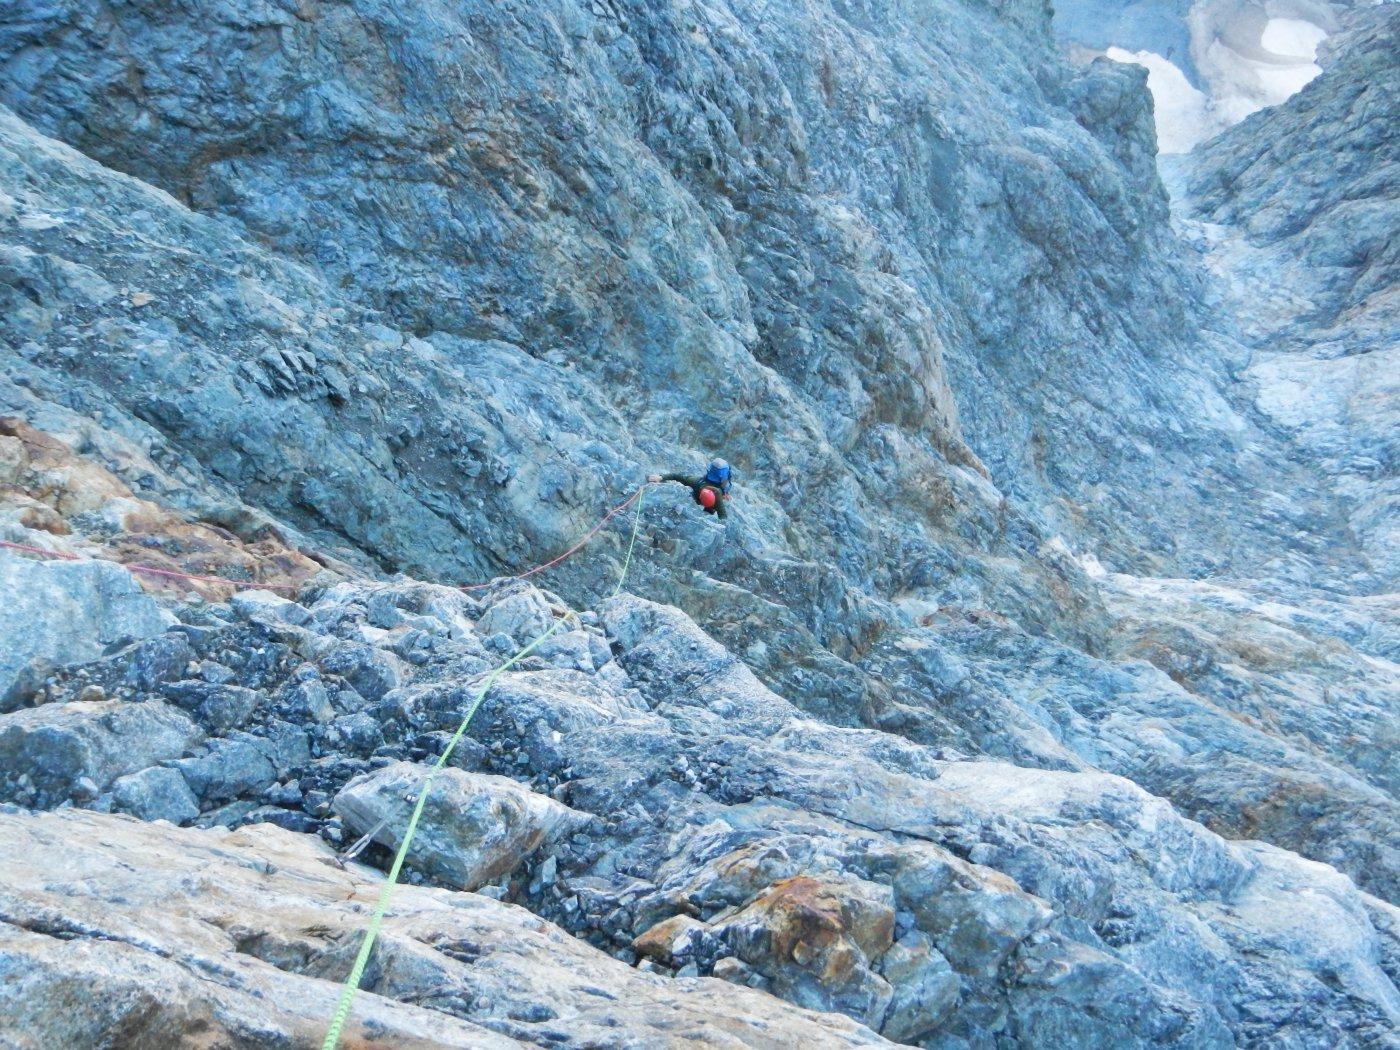 arrampicata parte bassa